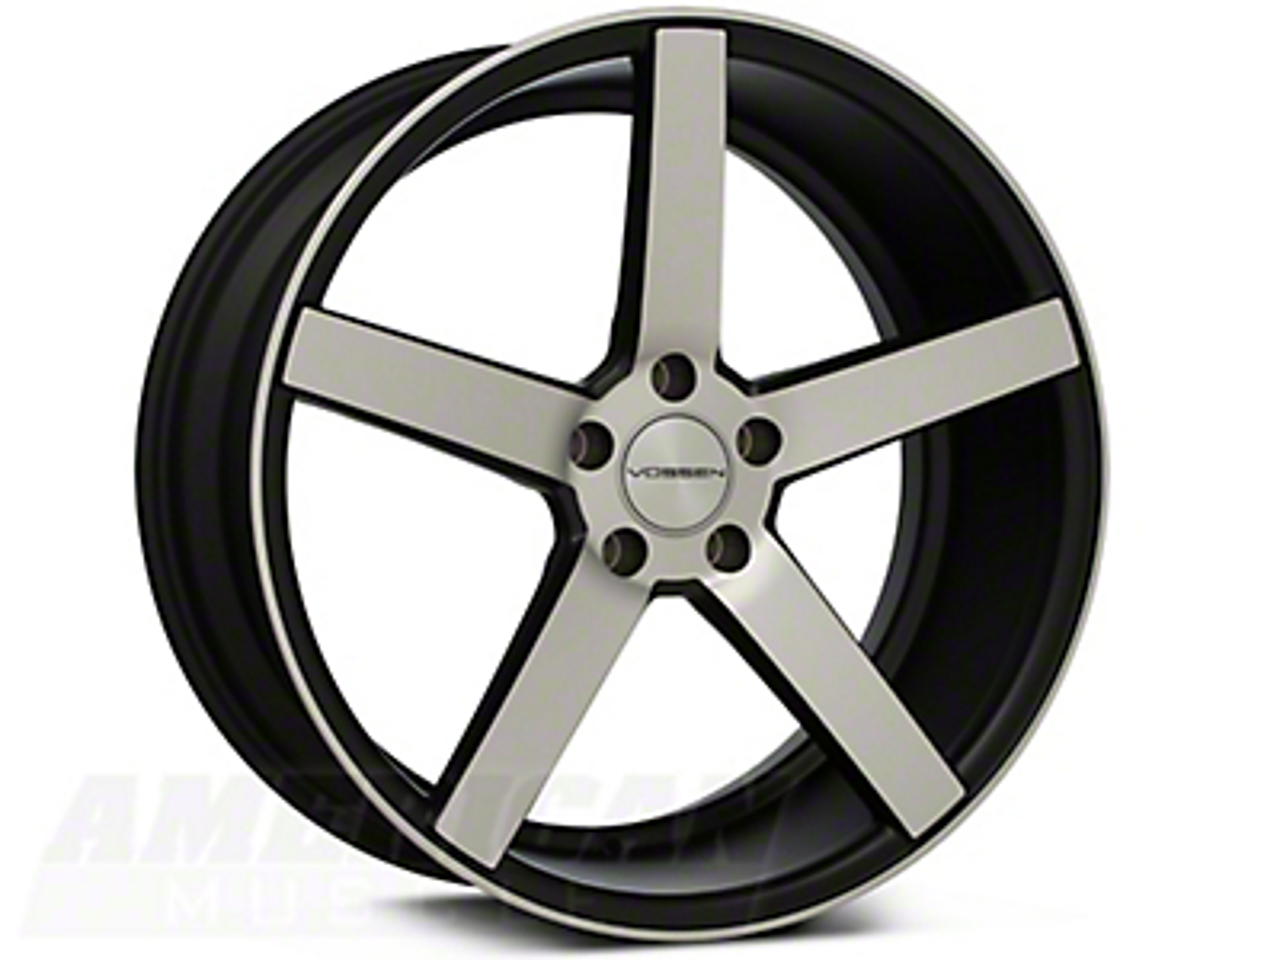 Vossen CV3 Machined Matte Black Wheel - 20x9 (05-14 All)